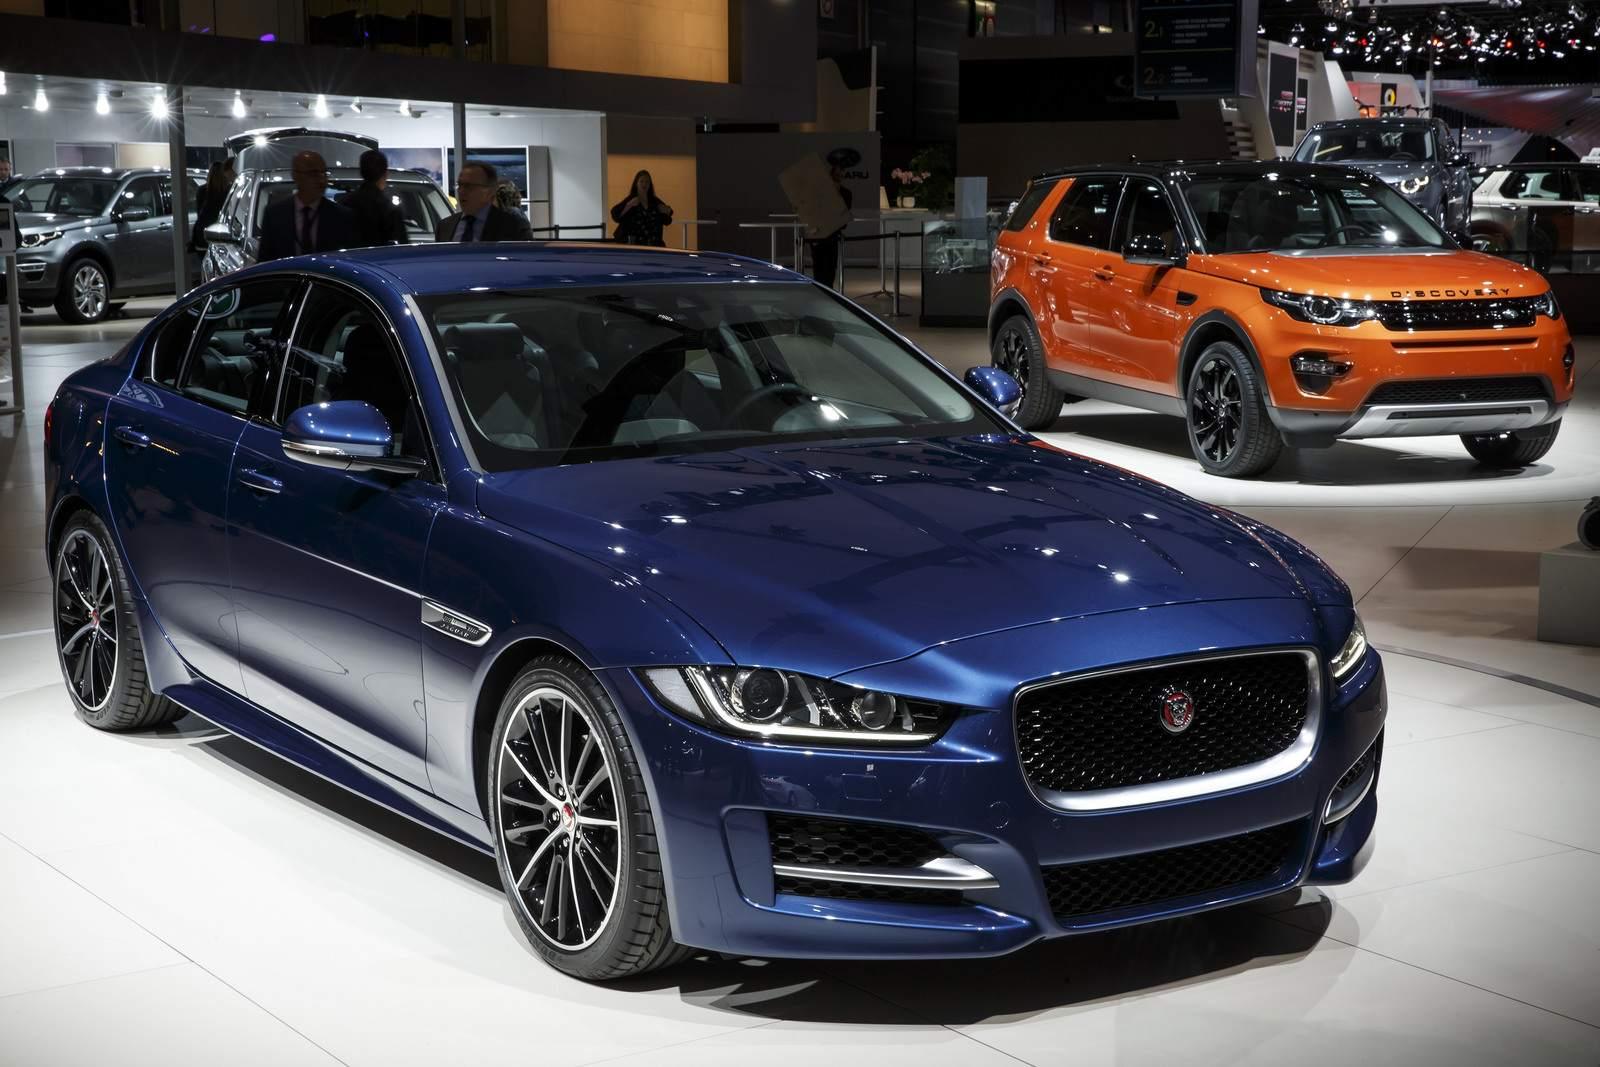 paris motor show6 Jaguar and Land Rover at Paris Auto Show 2014